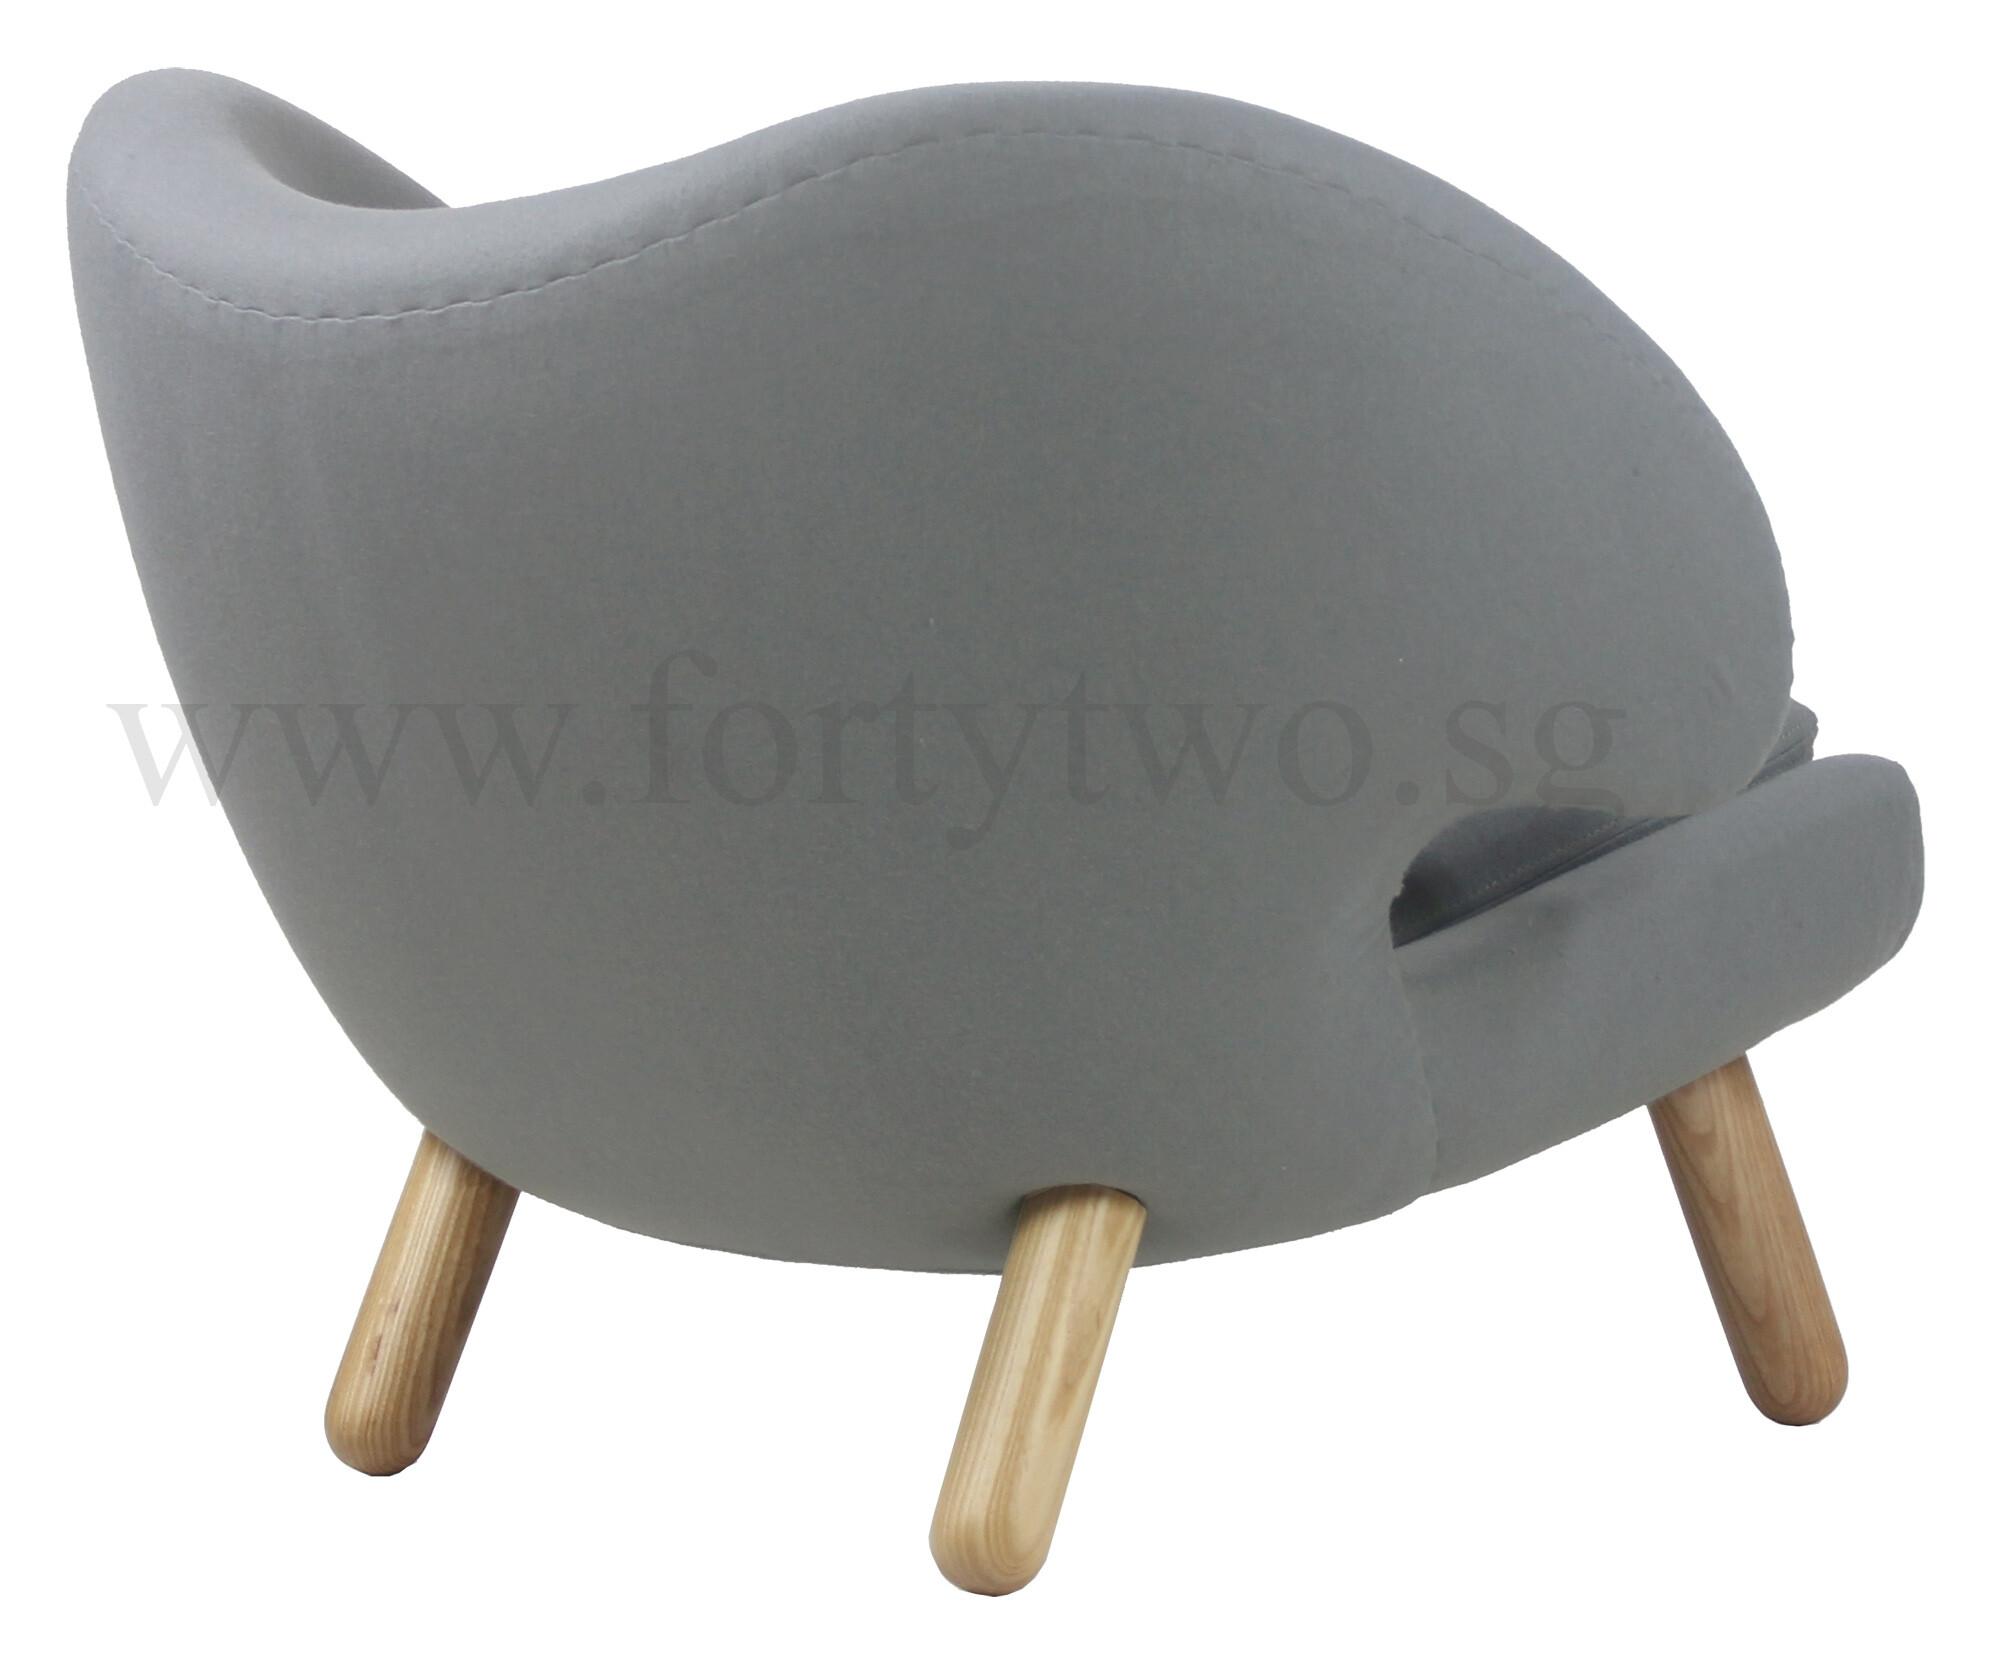 Designer Replica Pelican Chair in Light Grey | Furniture & Home ...